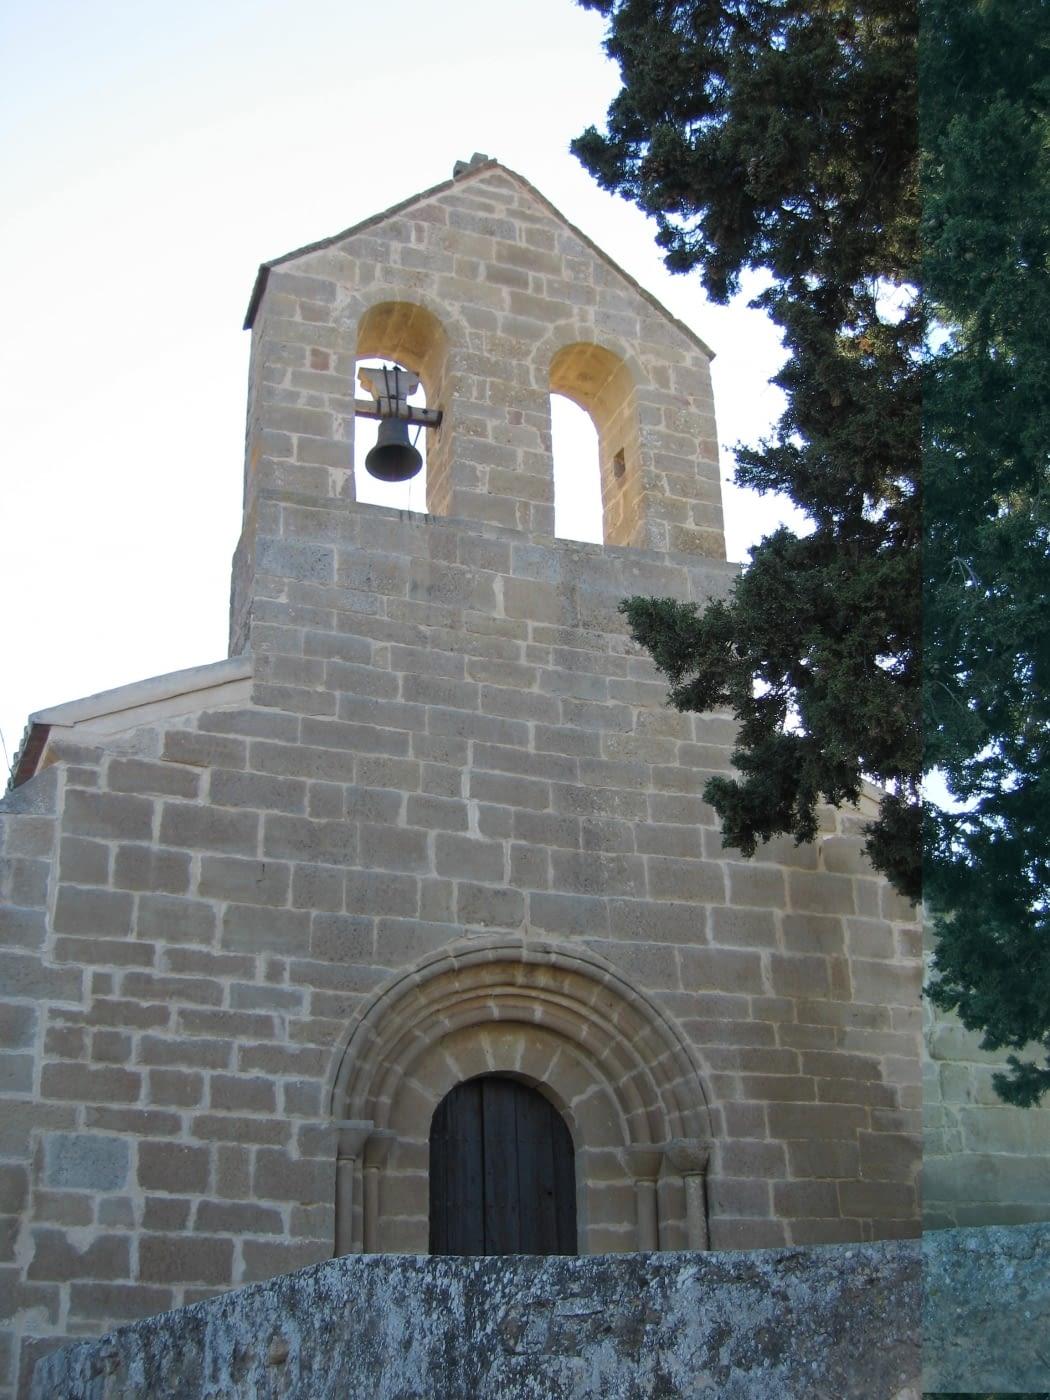 https://cdnebasnet.com/data/cache/opt_jpg/cms/turismeurgell/uploads/images/Pobles/Sergi-Cabrera-Duran-capella-del-Roser-IMG_8783-1548421549-1400x1400.jpg